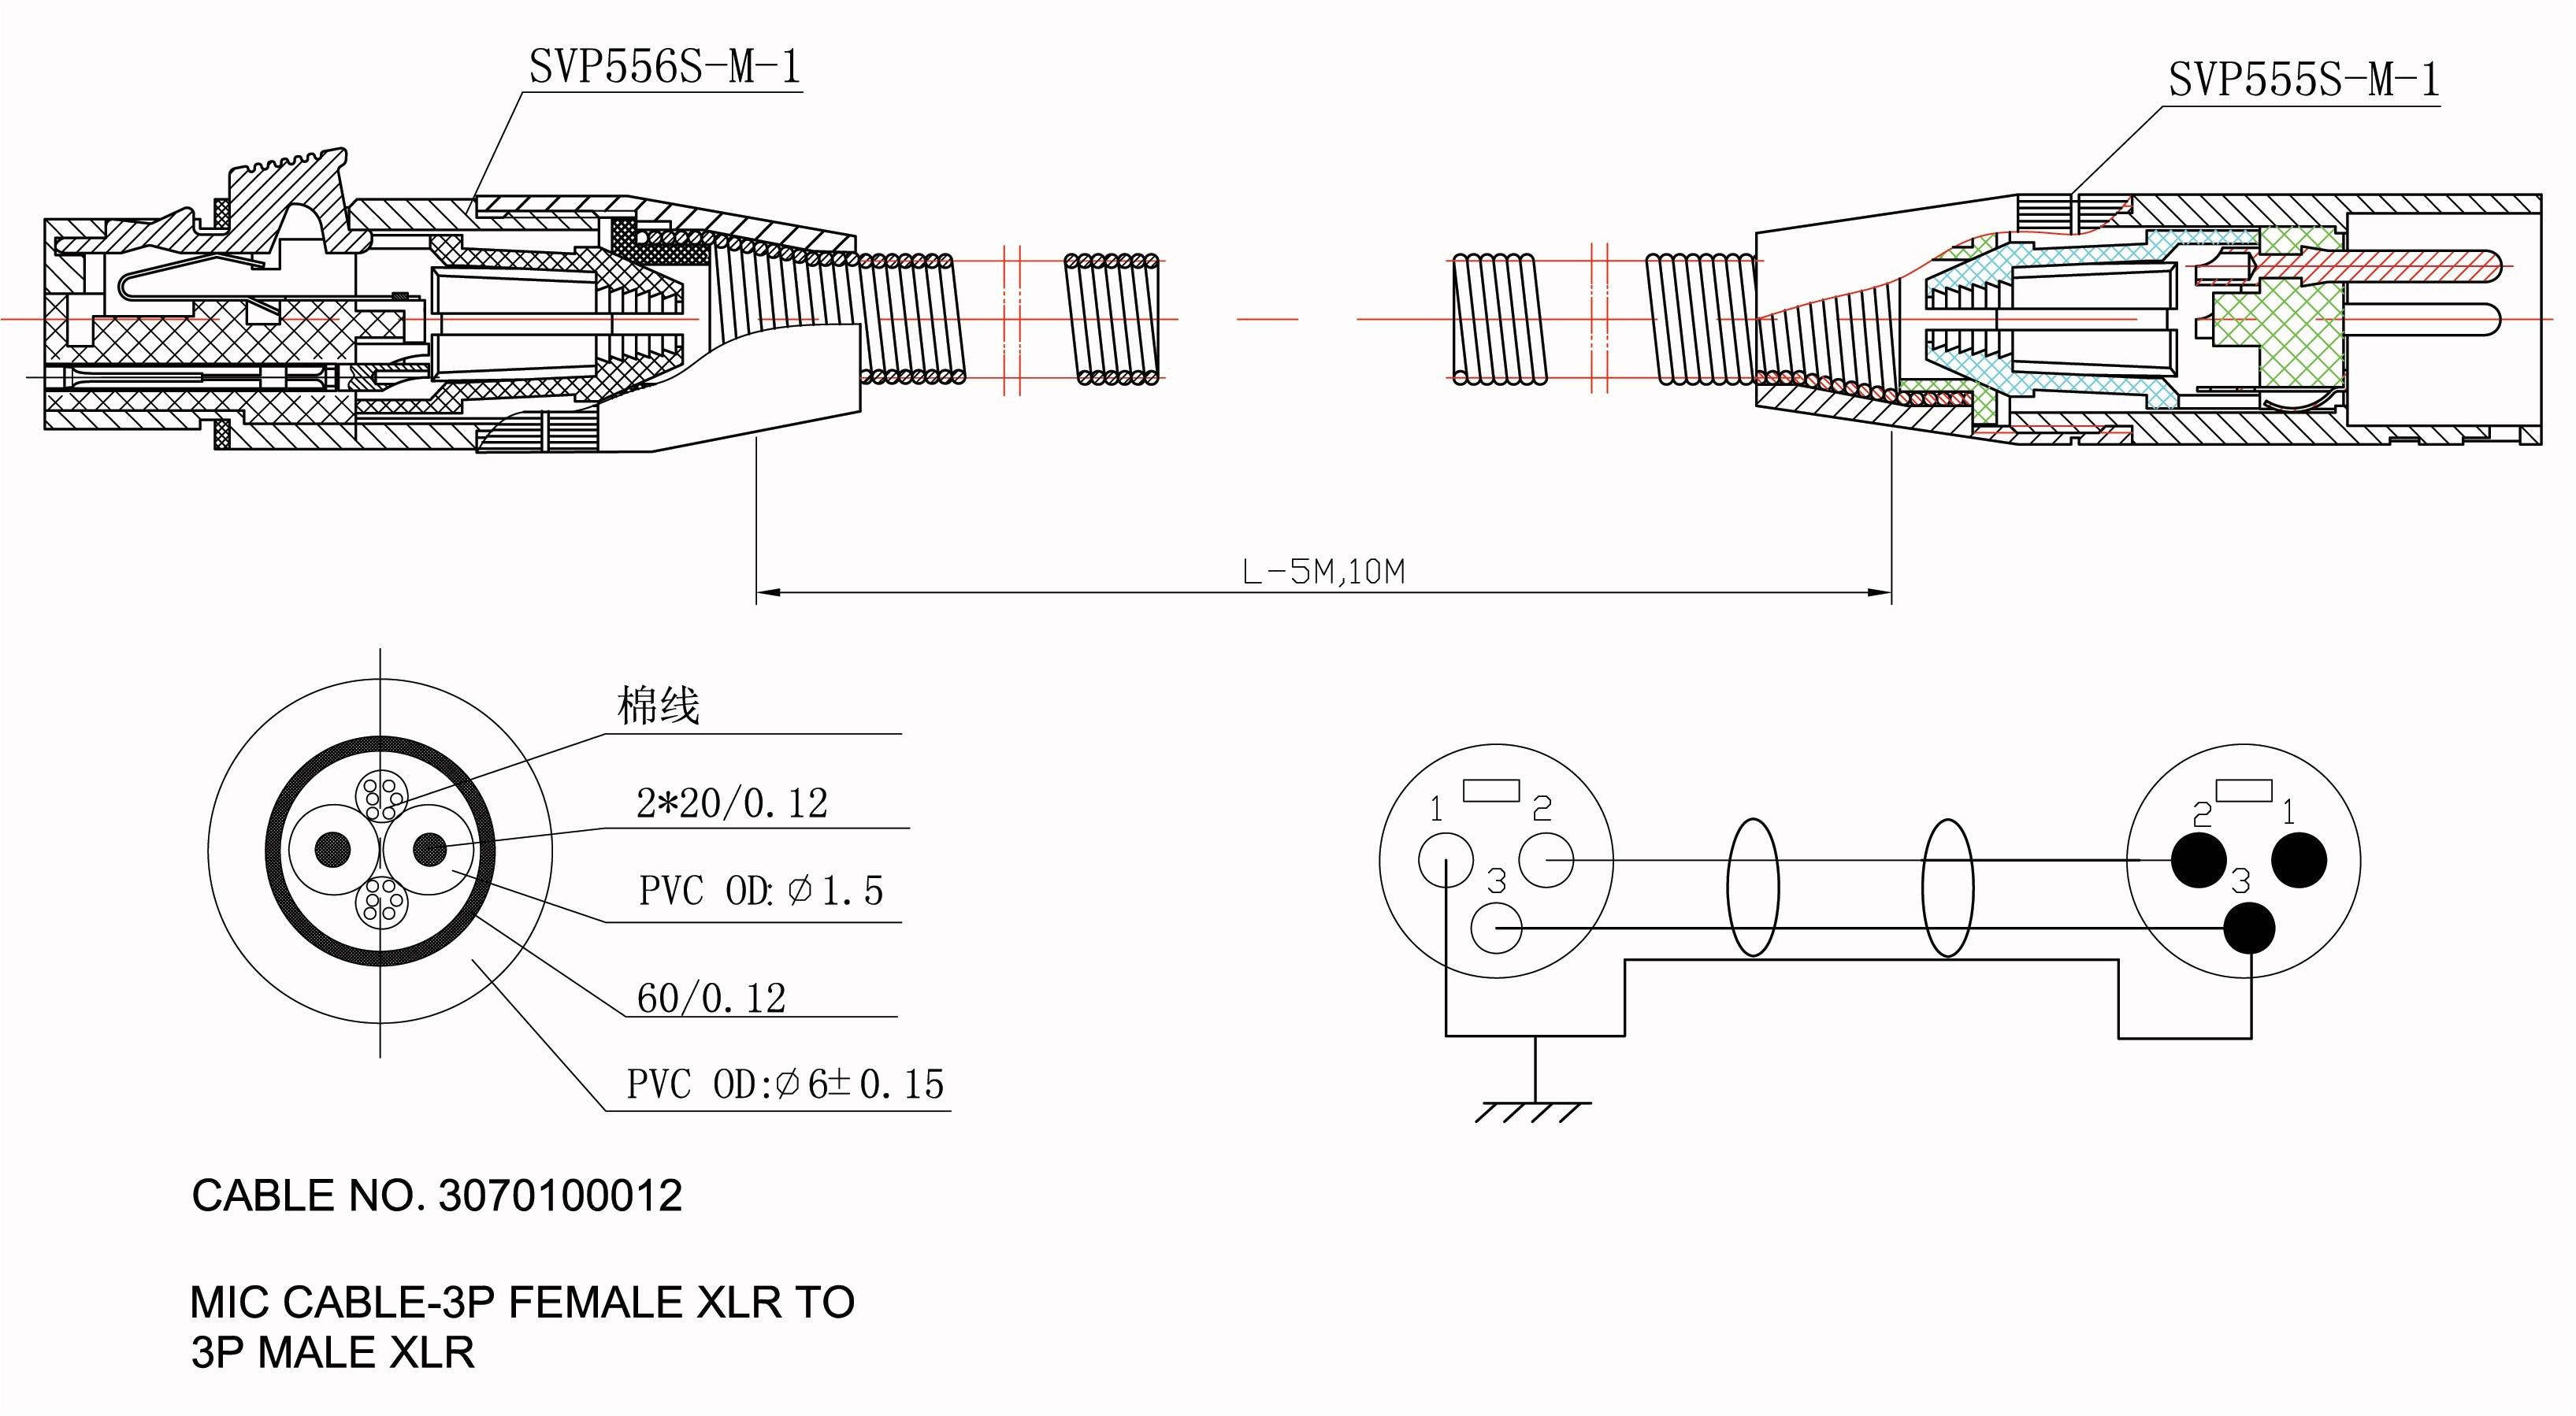 sony marine radio wiring diagram best of aftermarket stereo wiring golf cart radio diagram